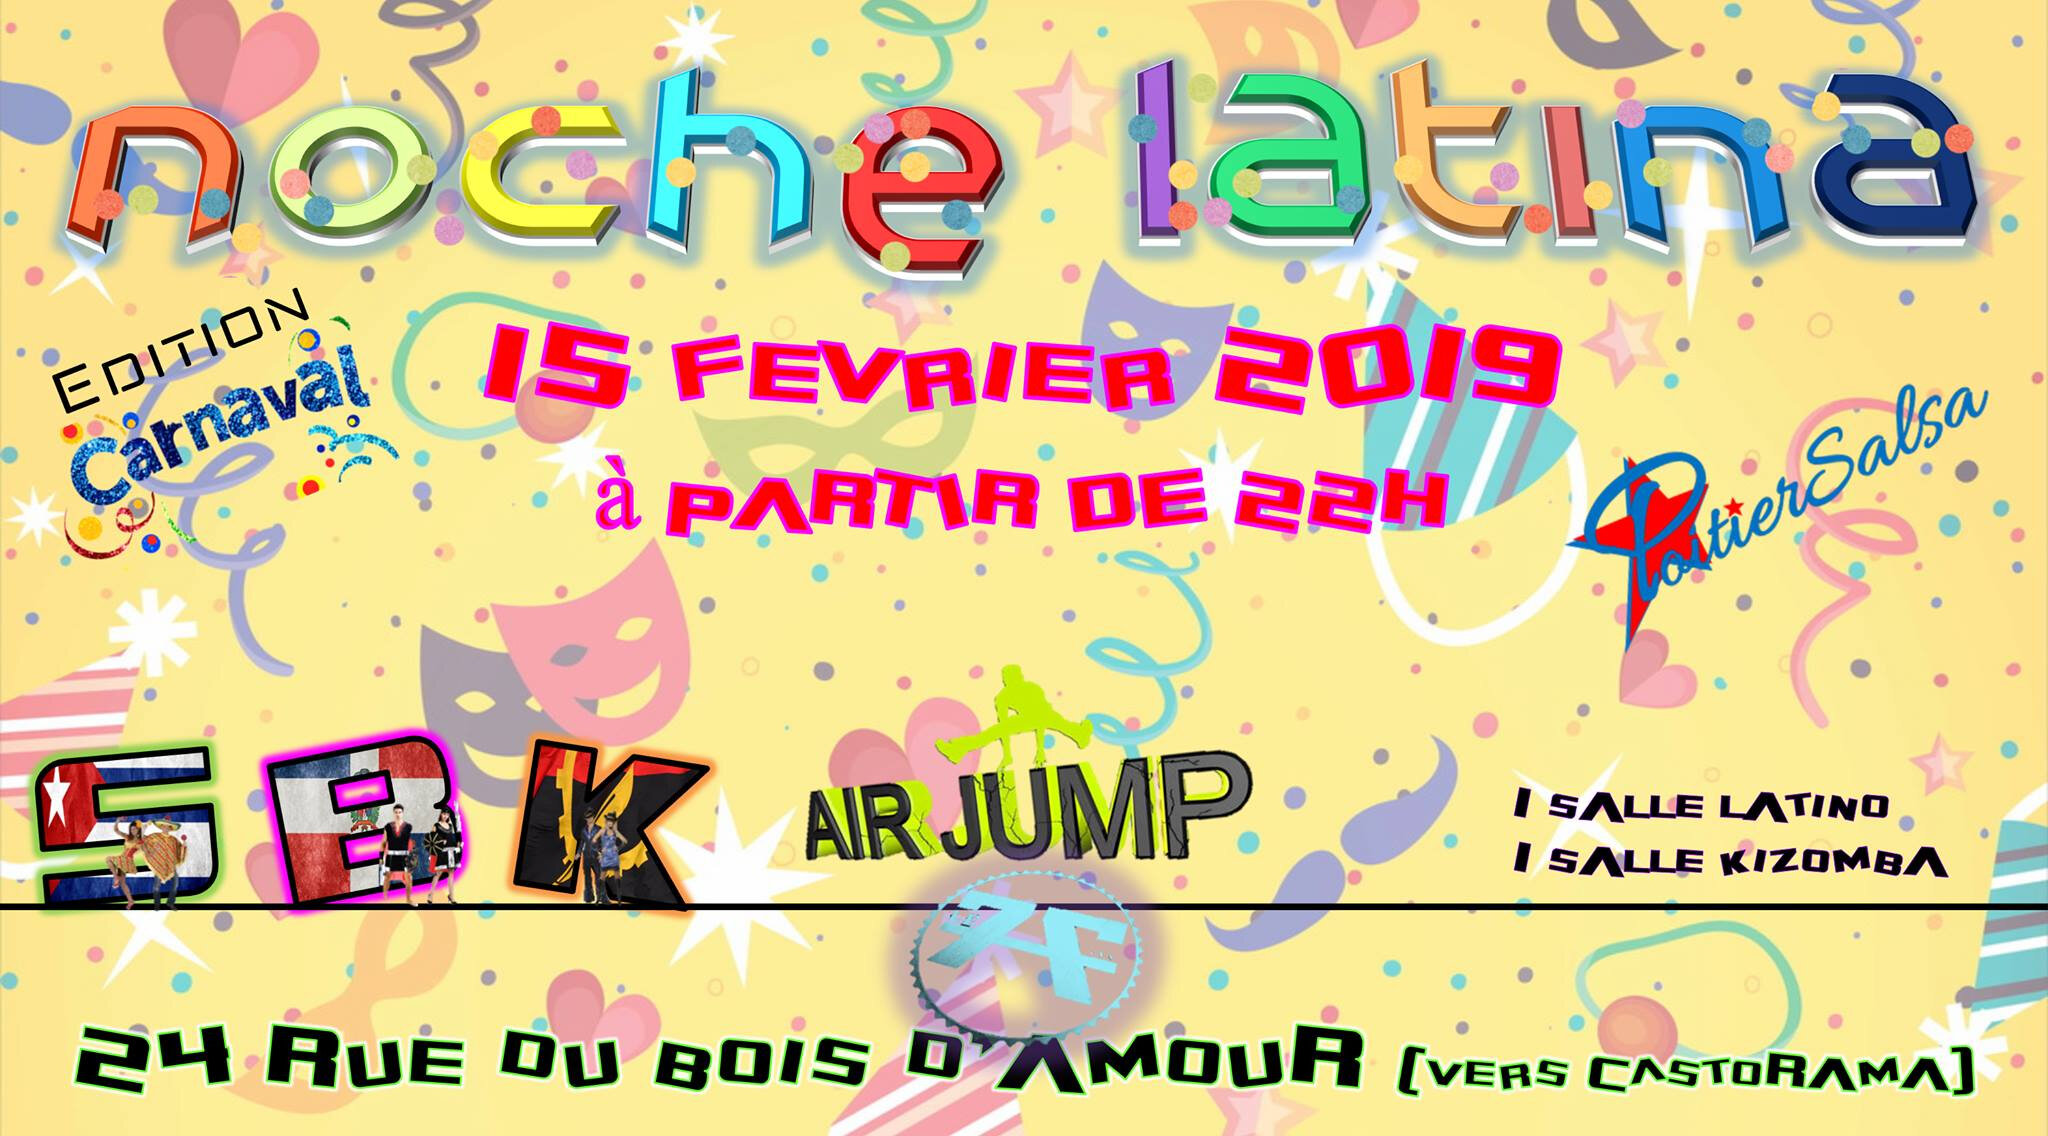 Noche latina Edition Carnaval :) du 15 février 2019